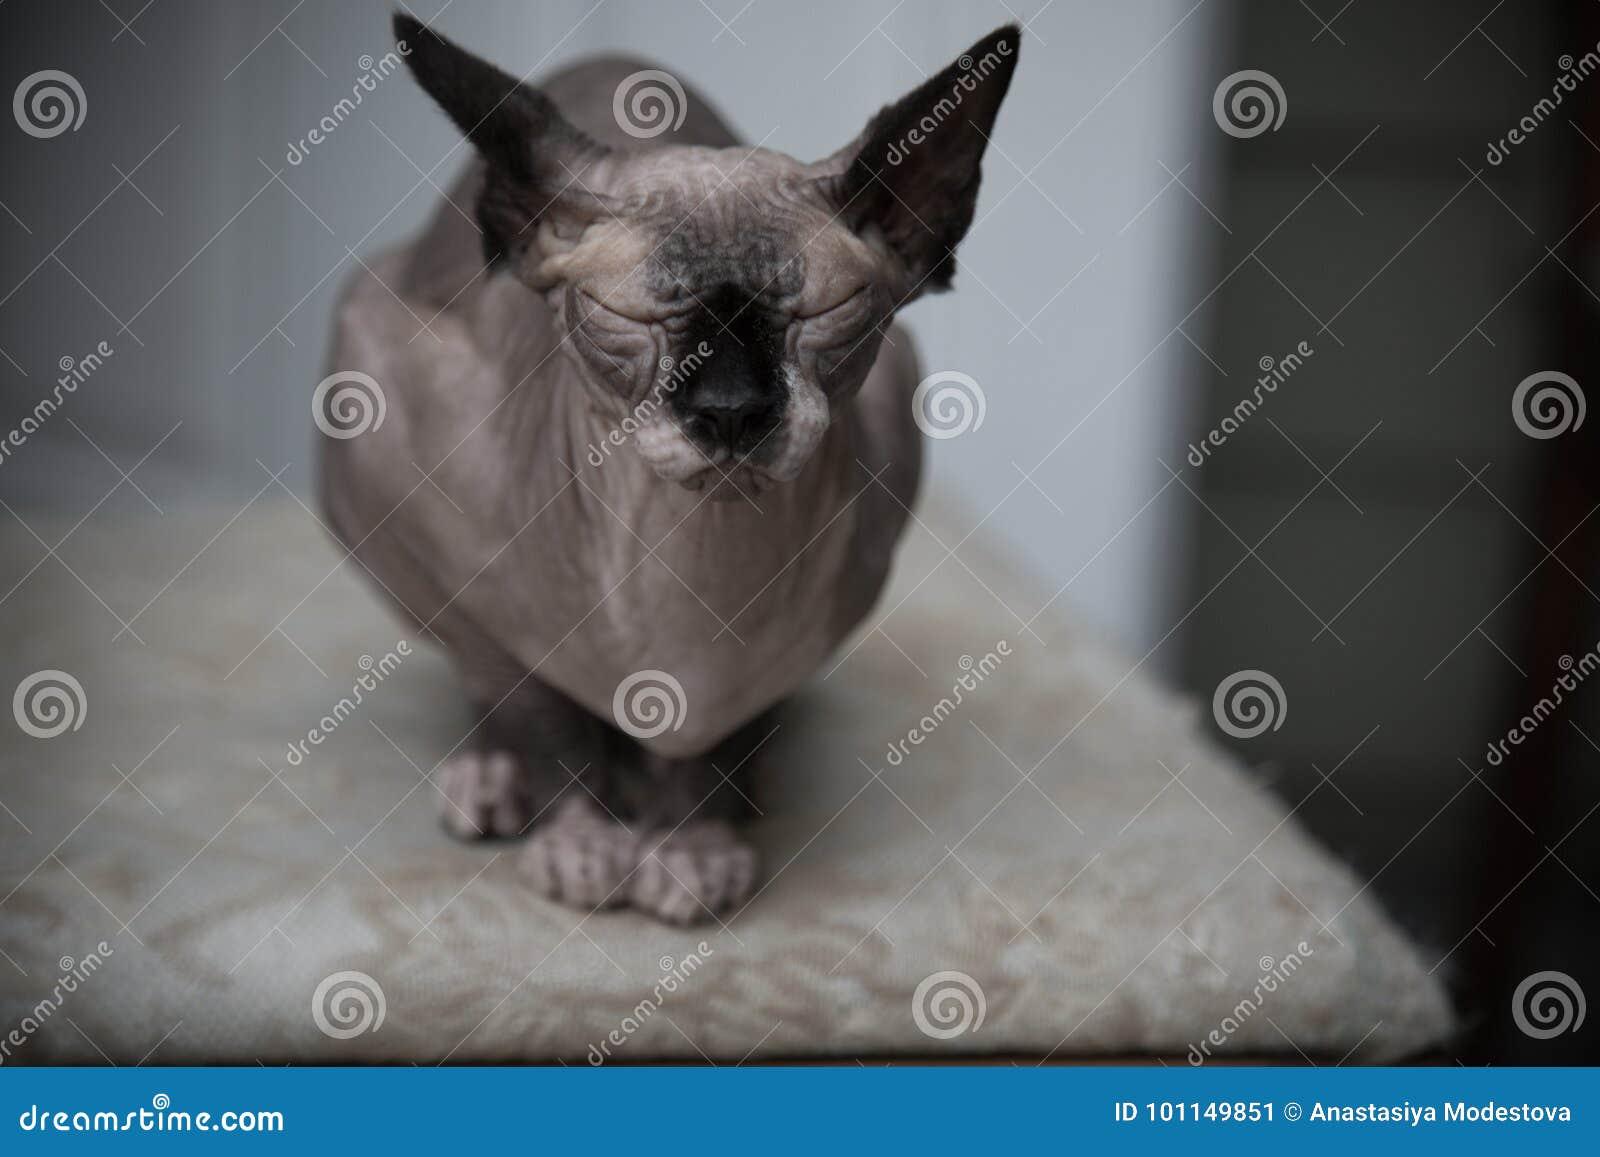 Funny sphinx cat portrait indoors medium shot shallow depth of field